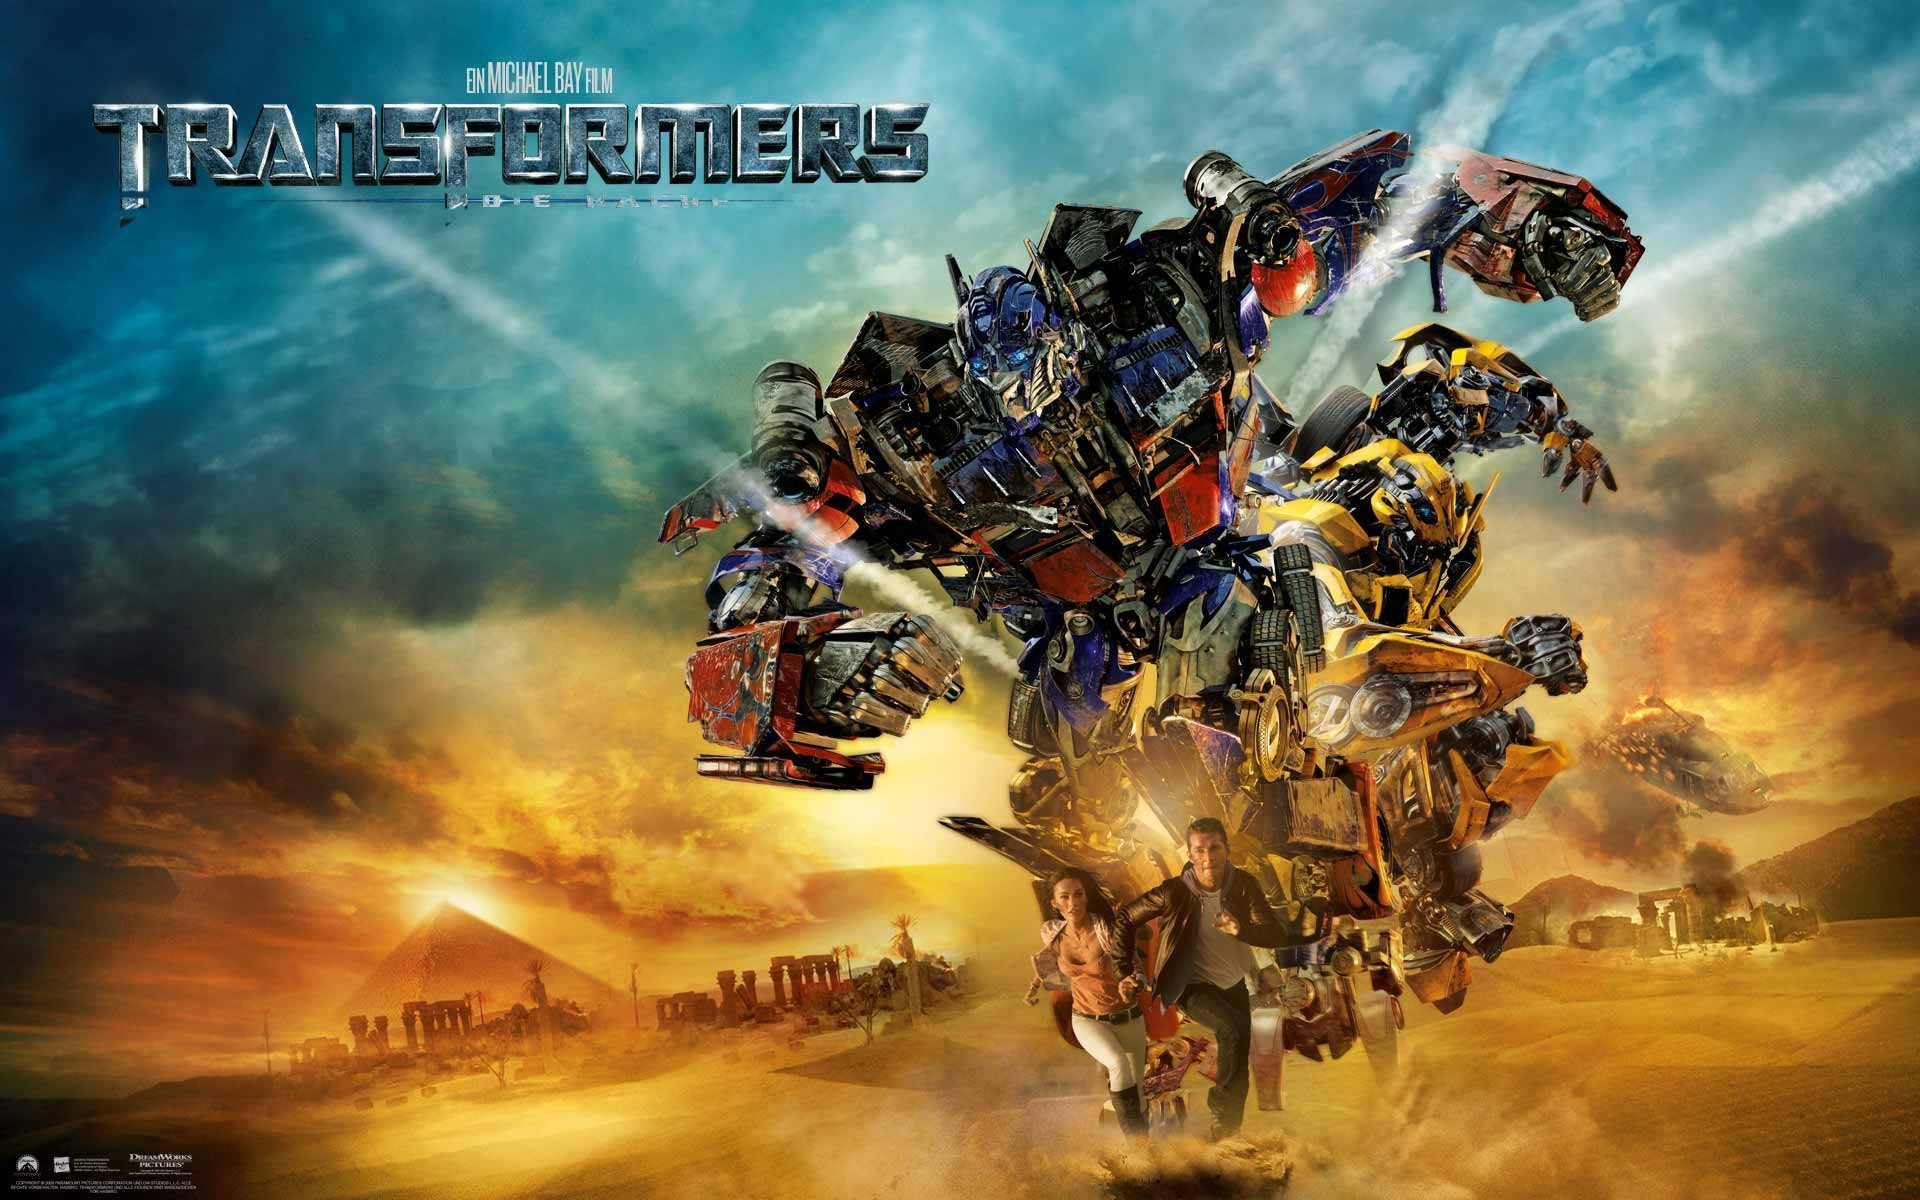 Free Download Transformers Revenge Of The Fallen Wallpaper Sf